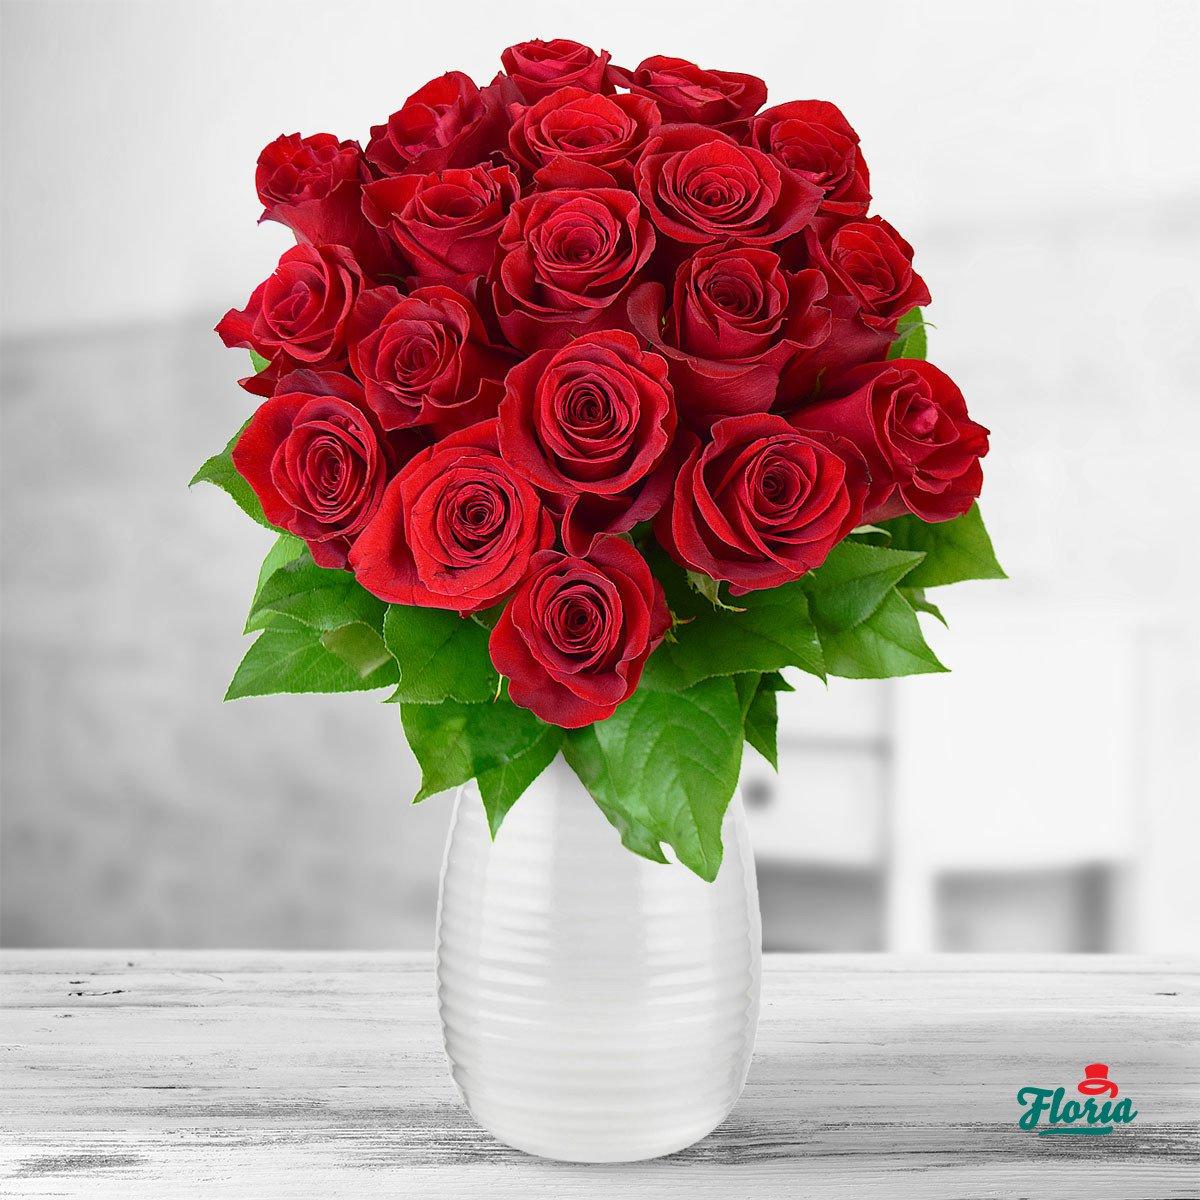 Trandafirii si mesajele pe care le transmit